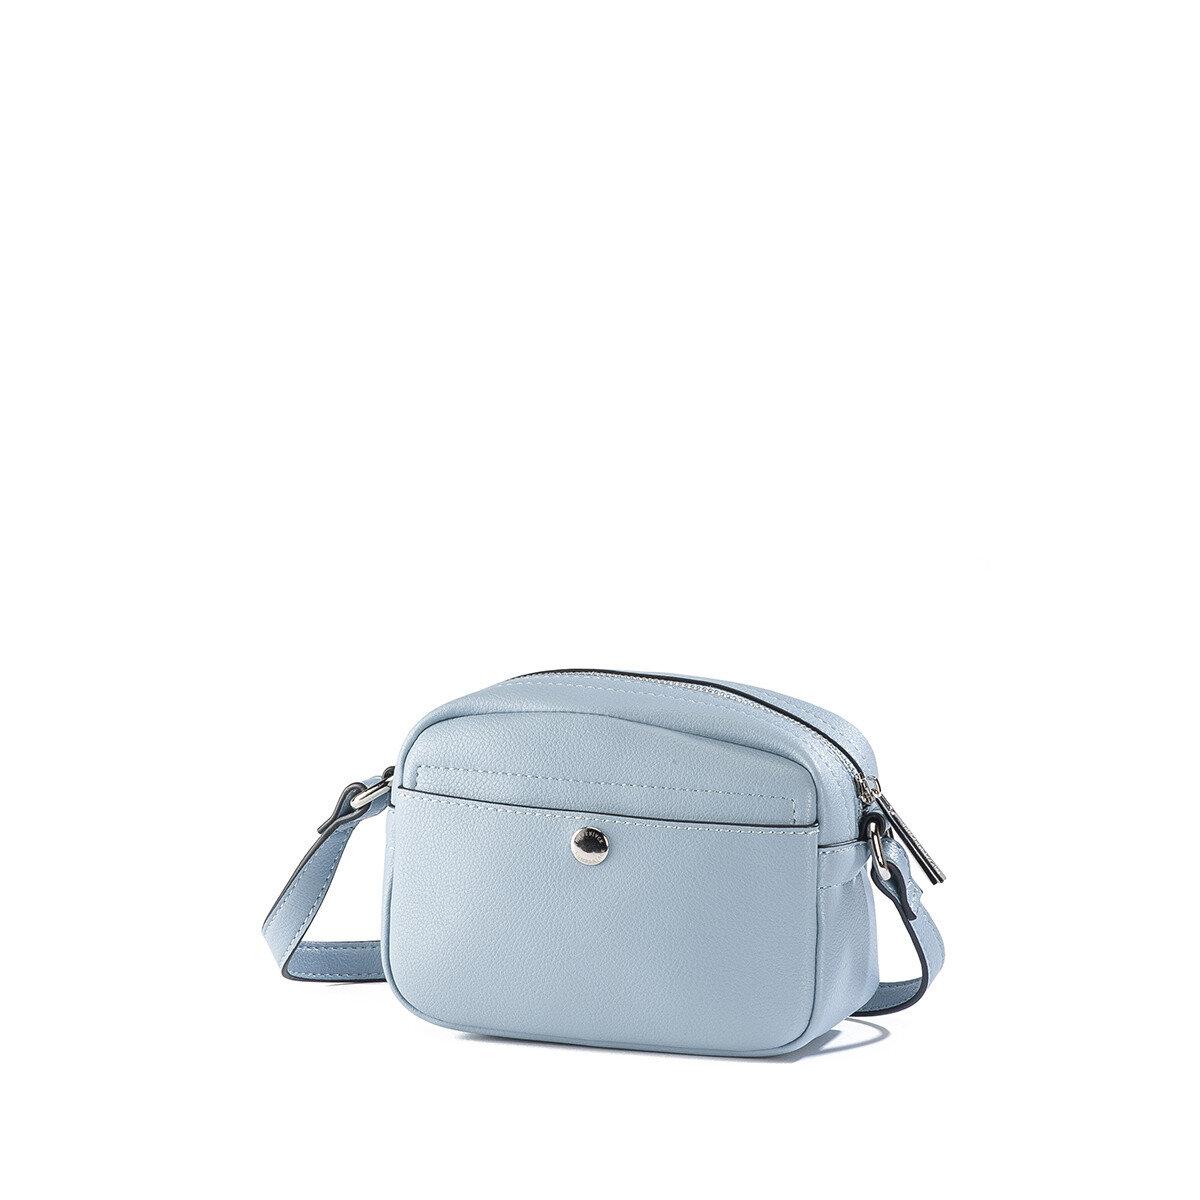 WPROJ.06 GREY Woman Shoulder bags